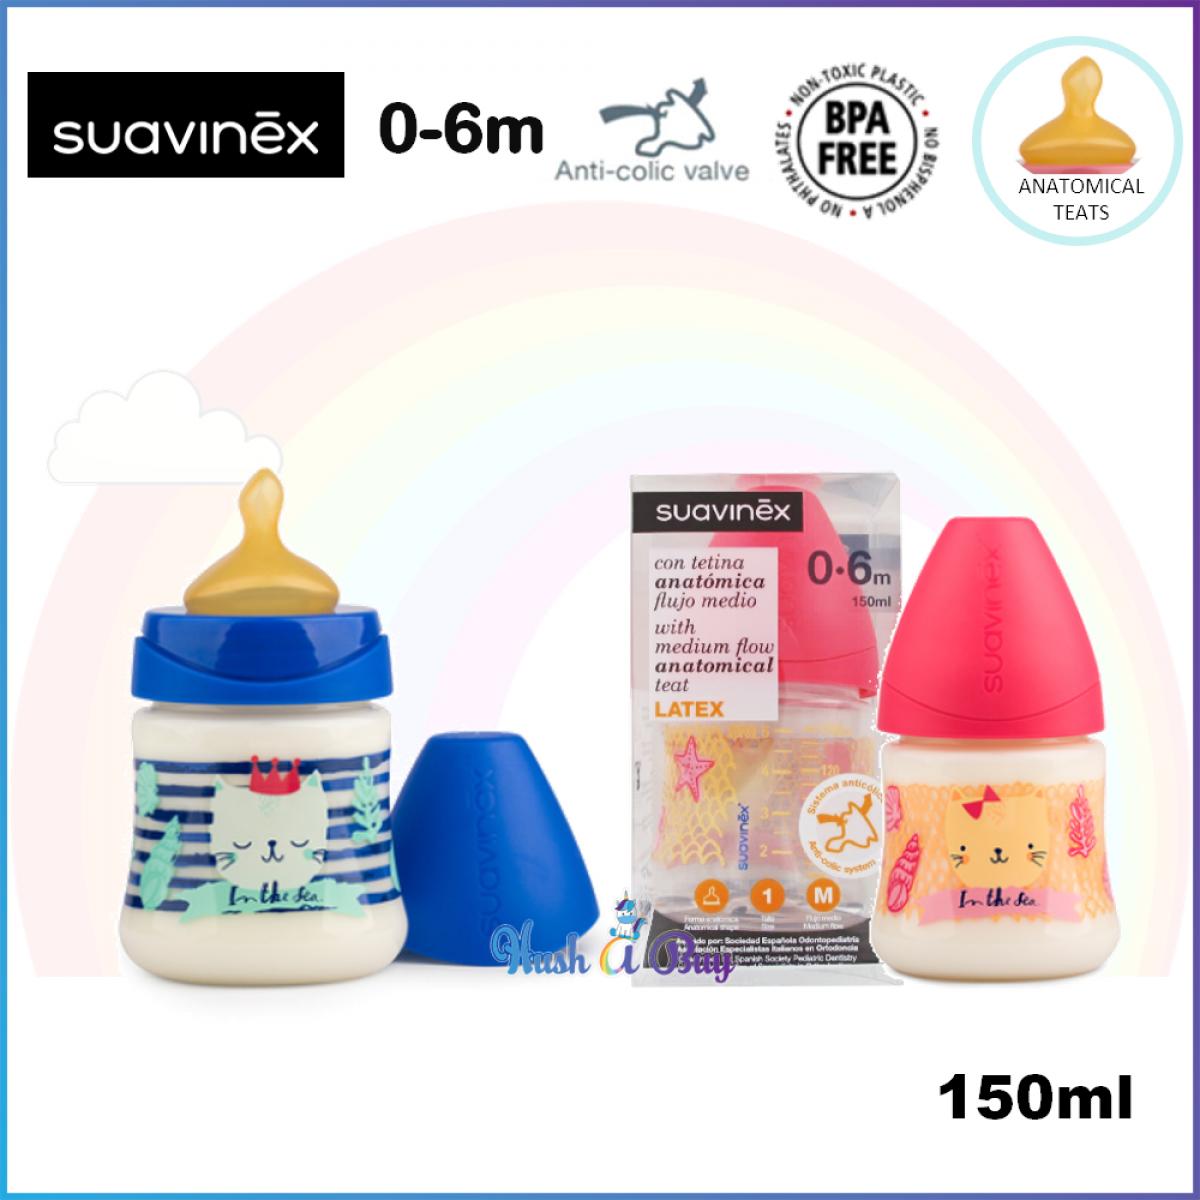 Suavinex Feeding Bottle 0.6M Slow Flow with Anatomical Teat -150ml